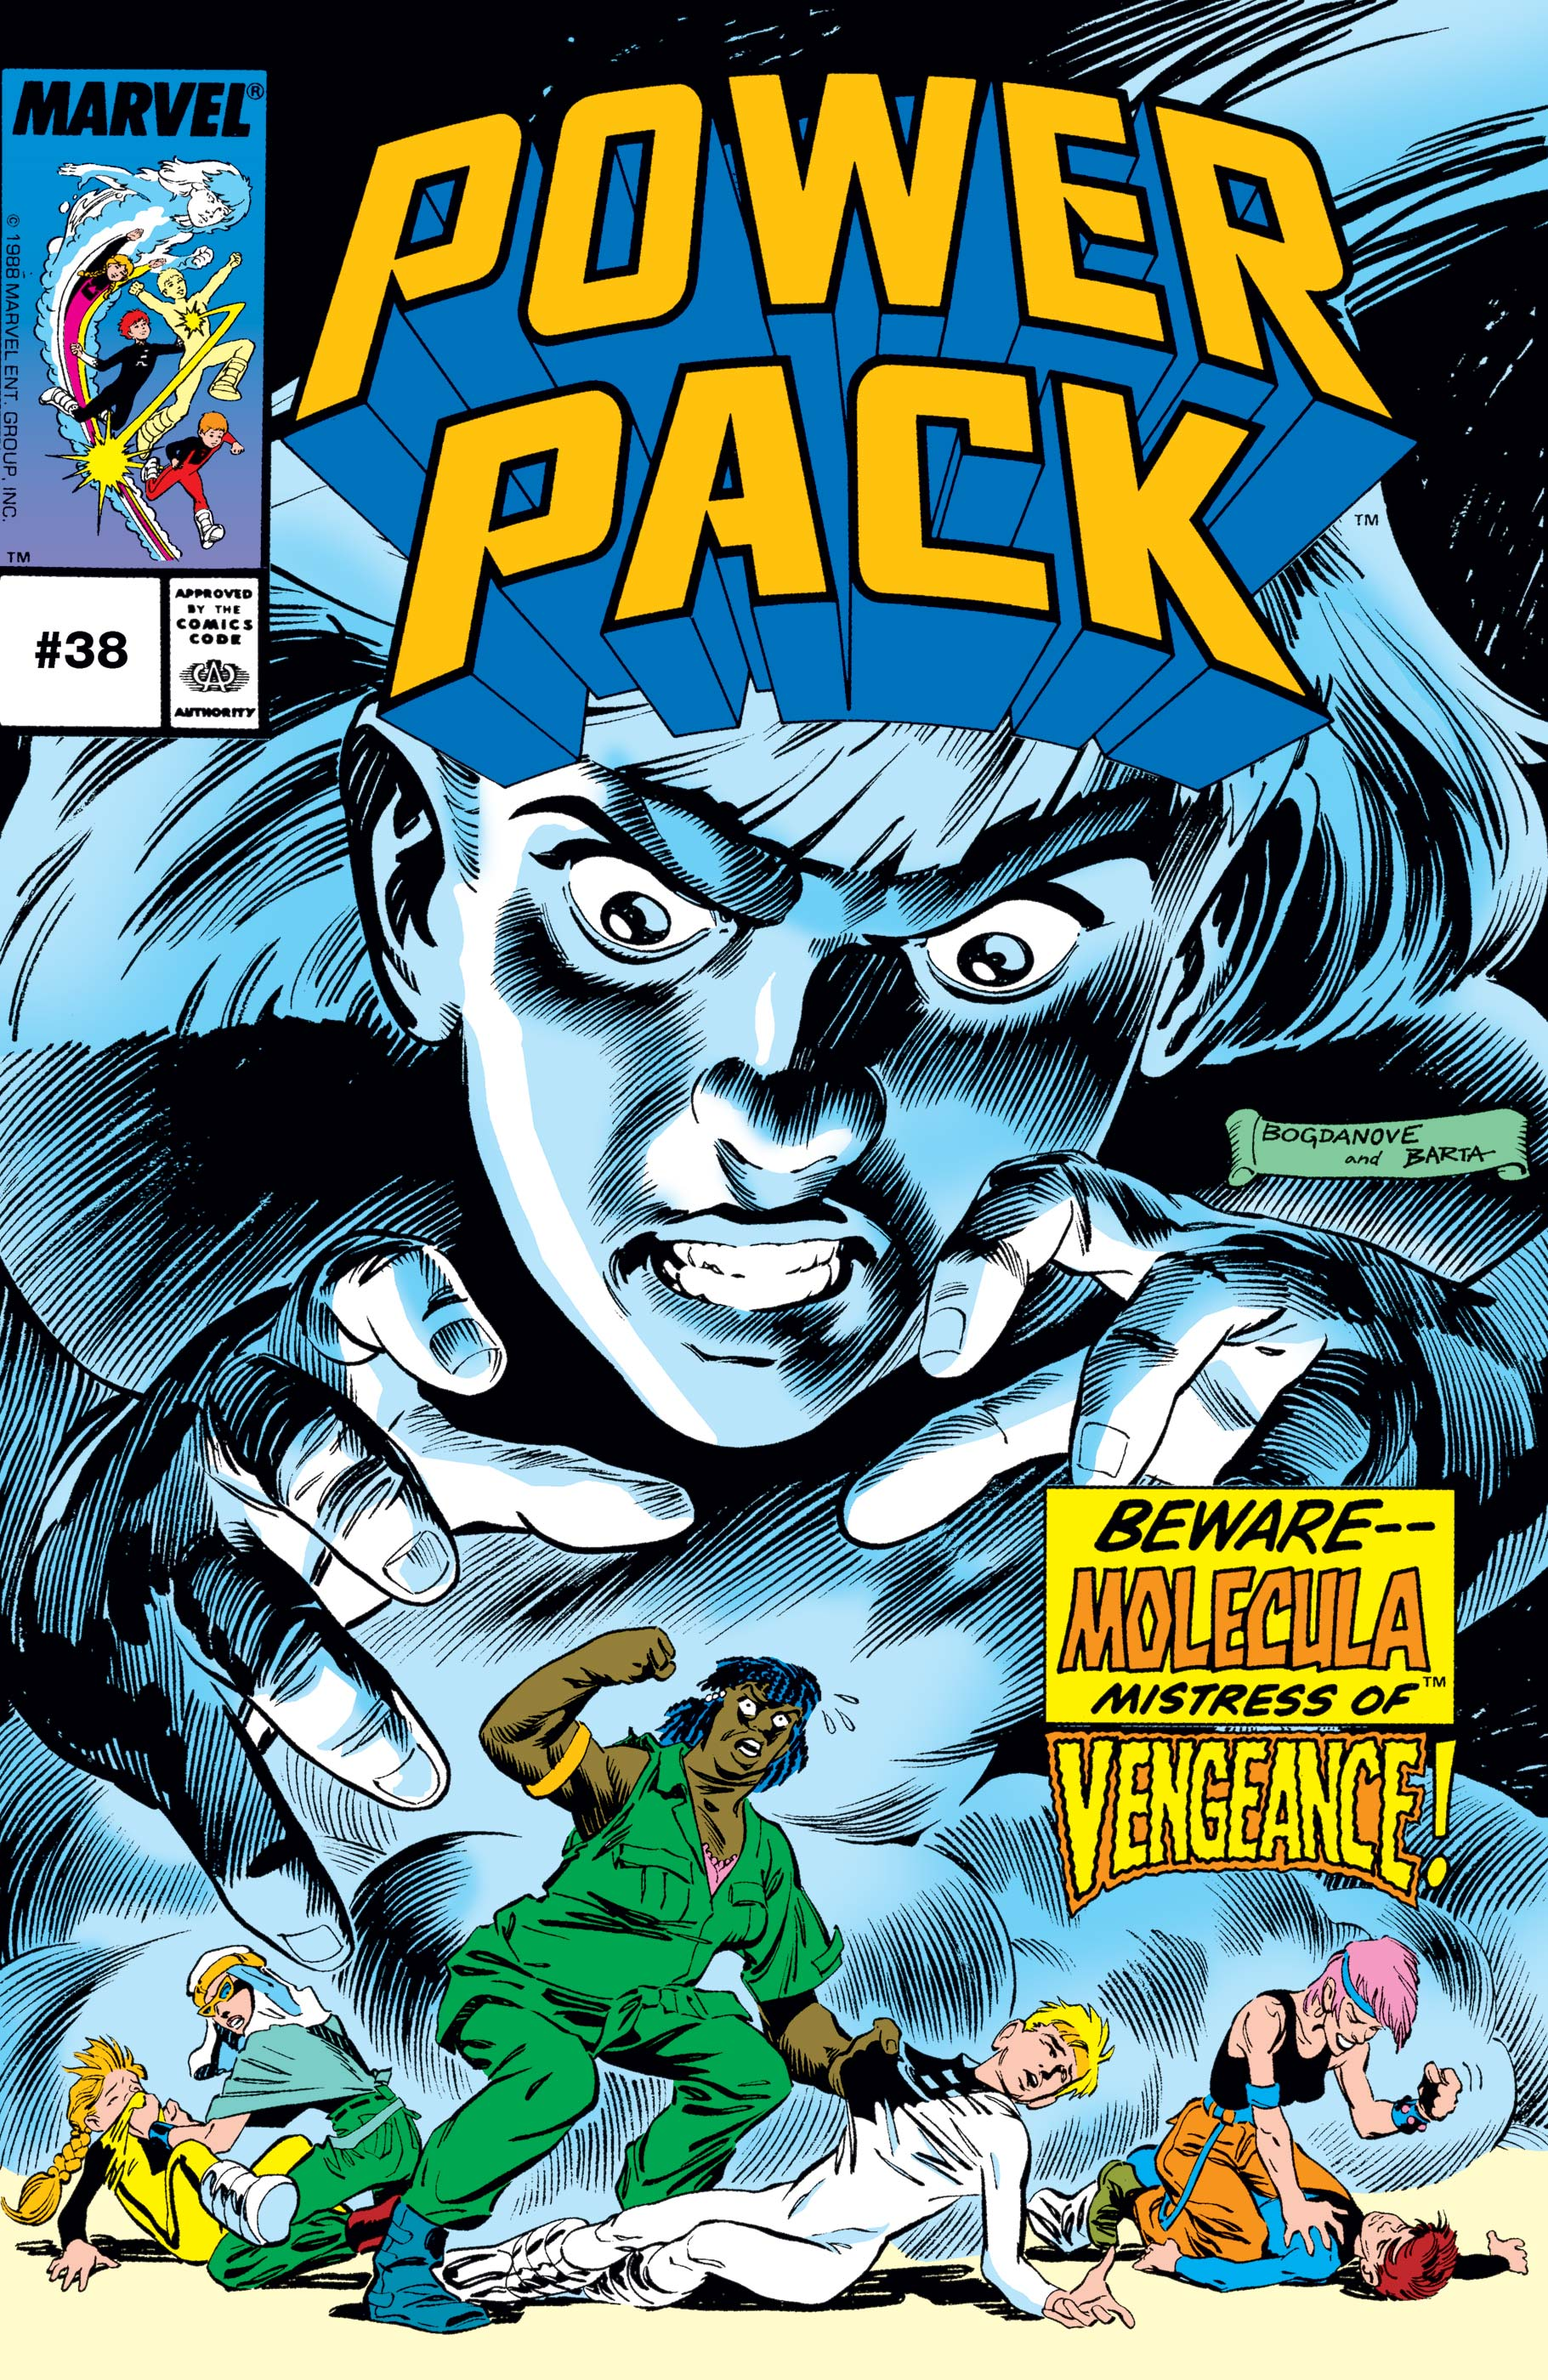 Power Pack (1984) #38